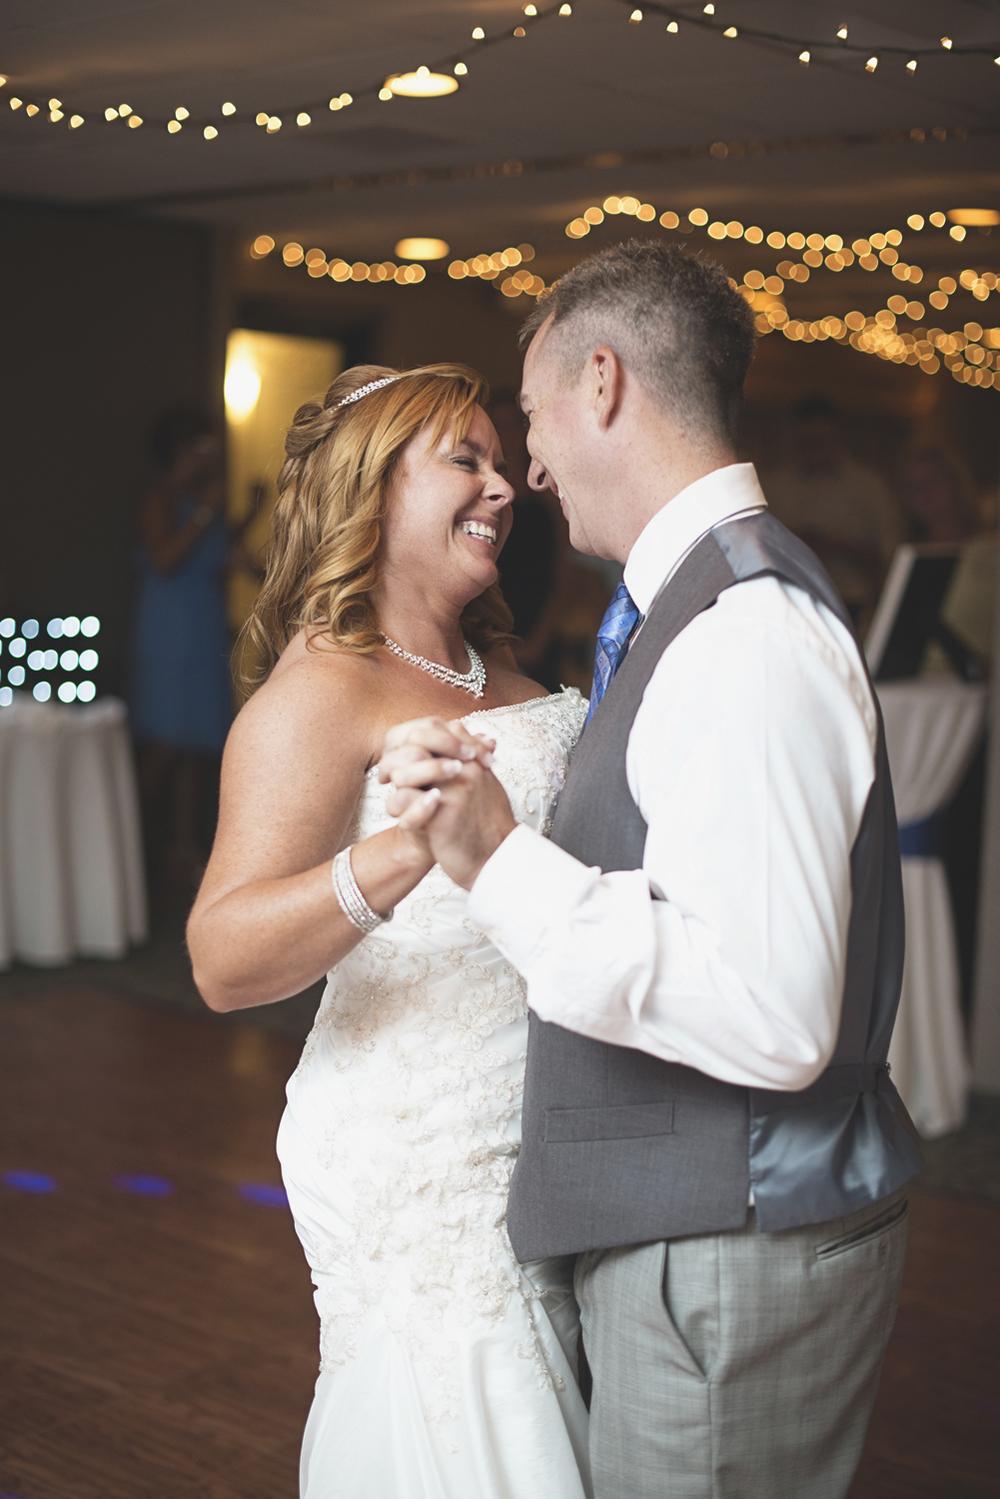 Virginia Beach Oceanfront Wedding | Bride and groom first dance